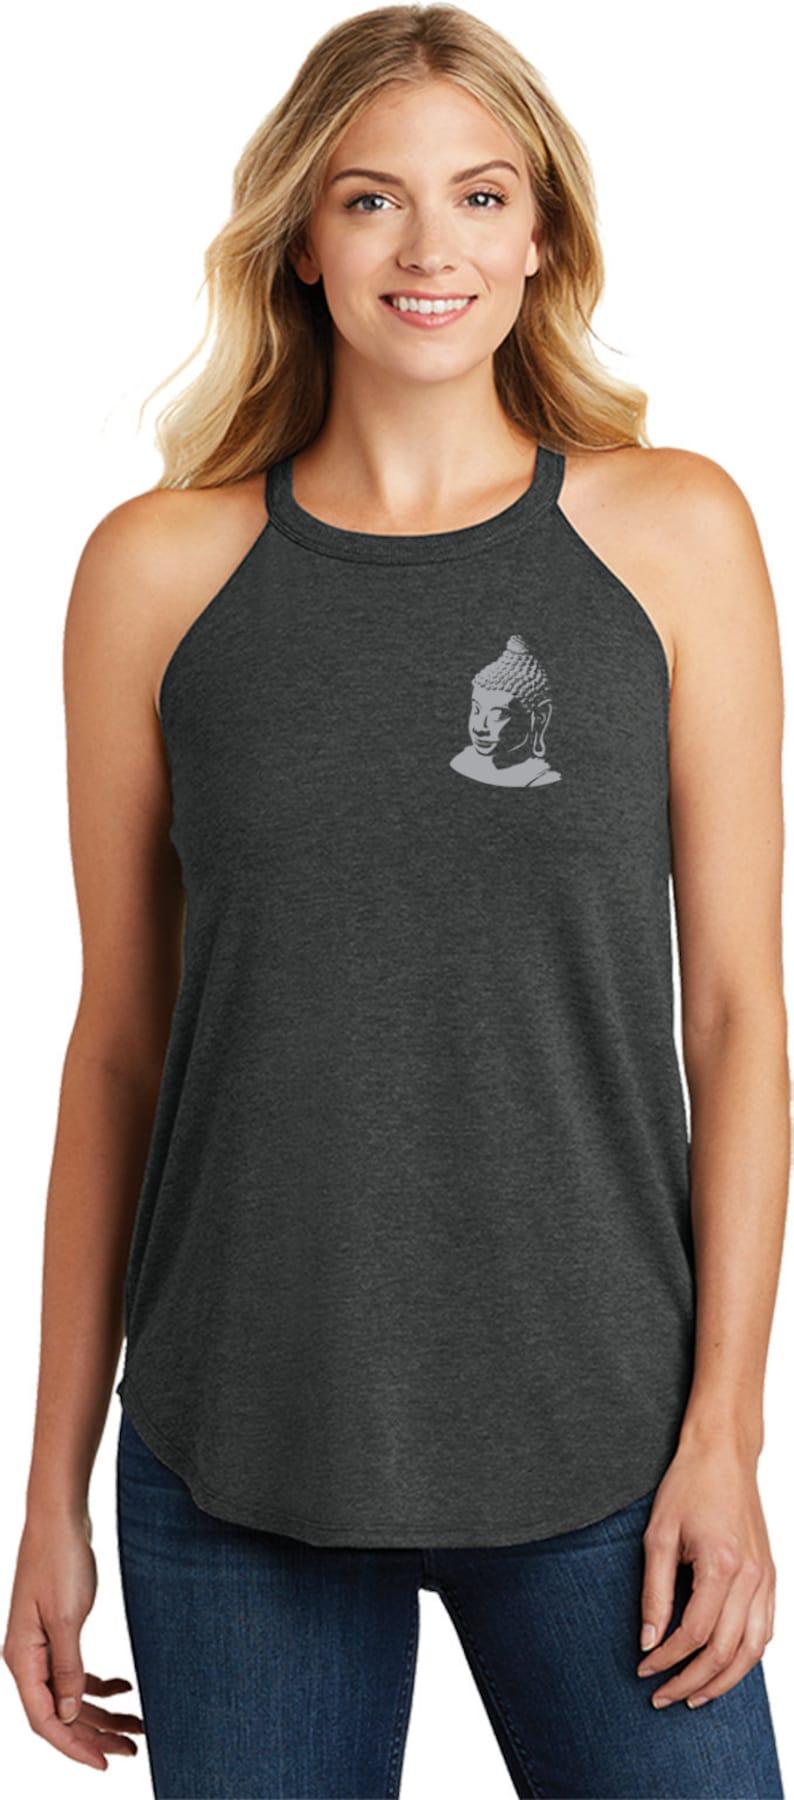 Buddha Pocket Print Ladies Yoga Tri Blend Rocker Tanktop = BUDDHA-PP-DT137L